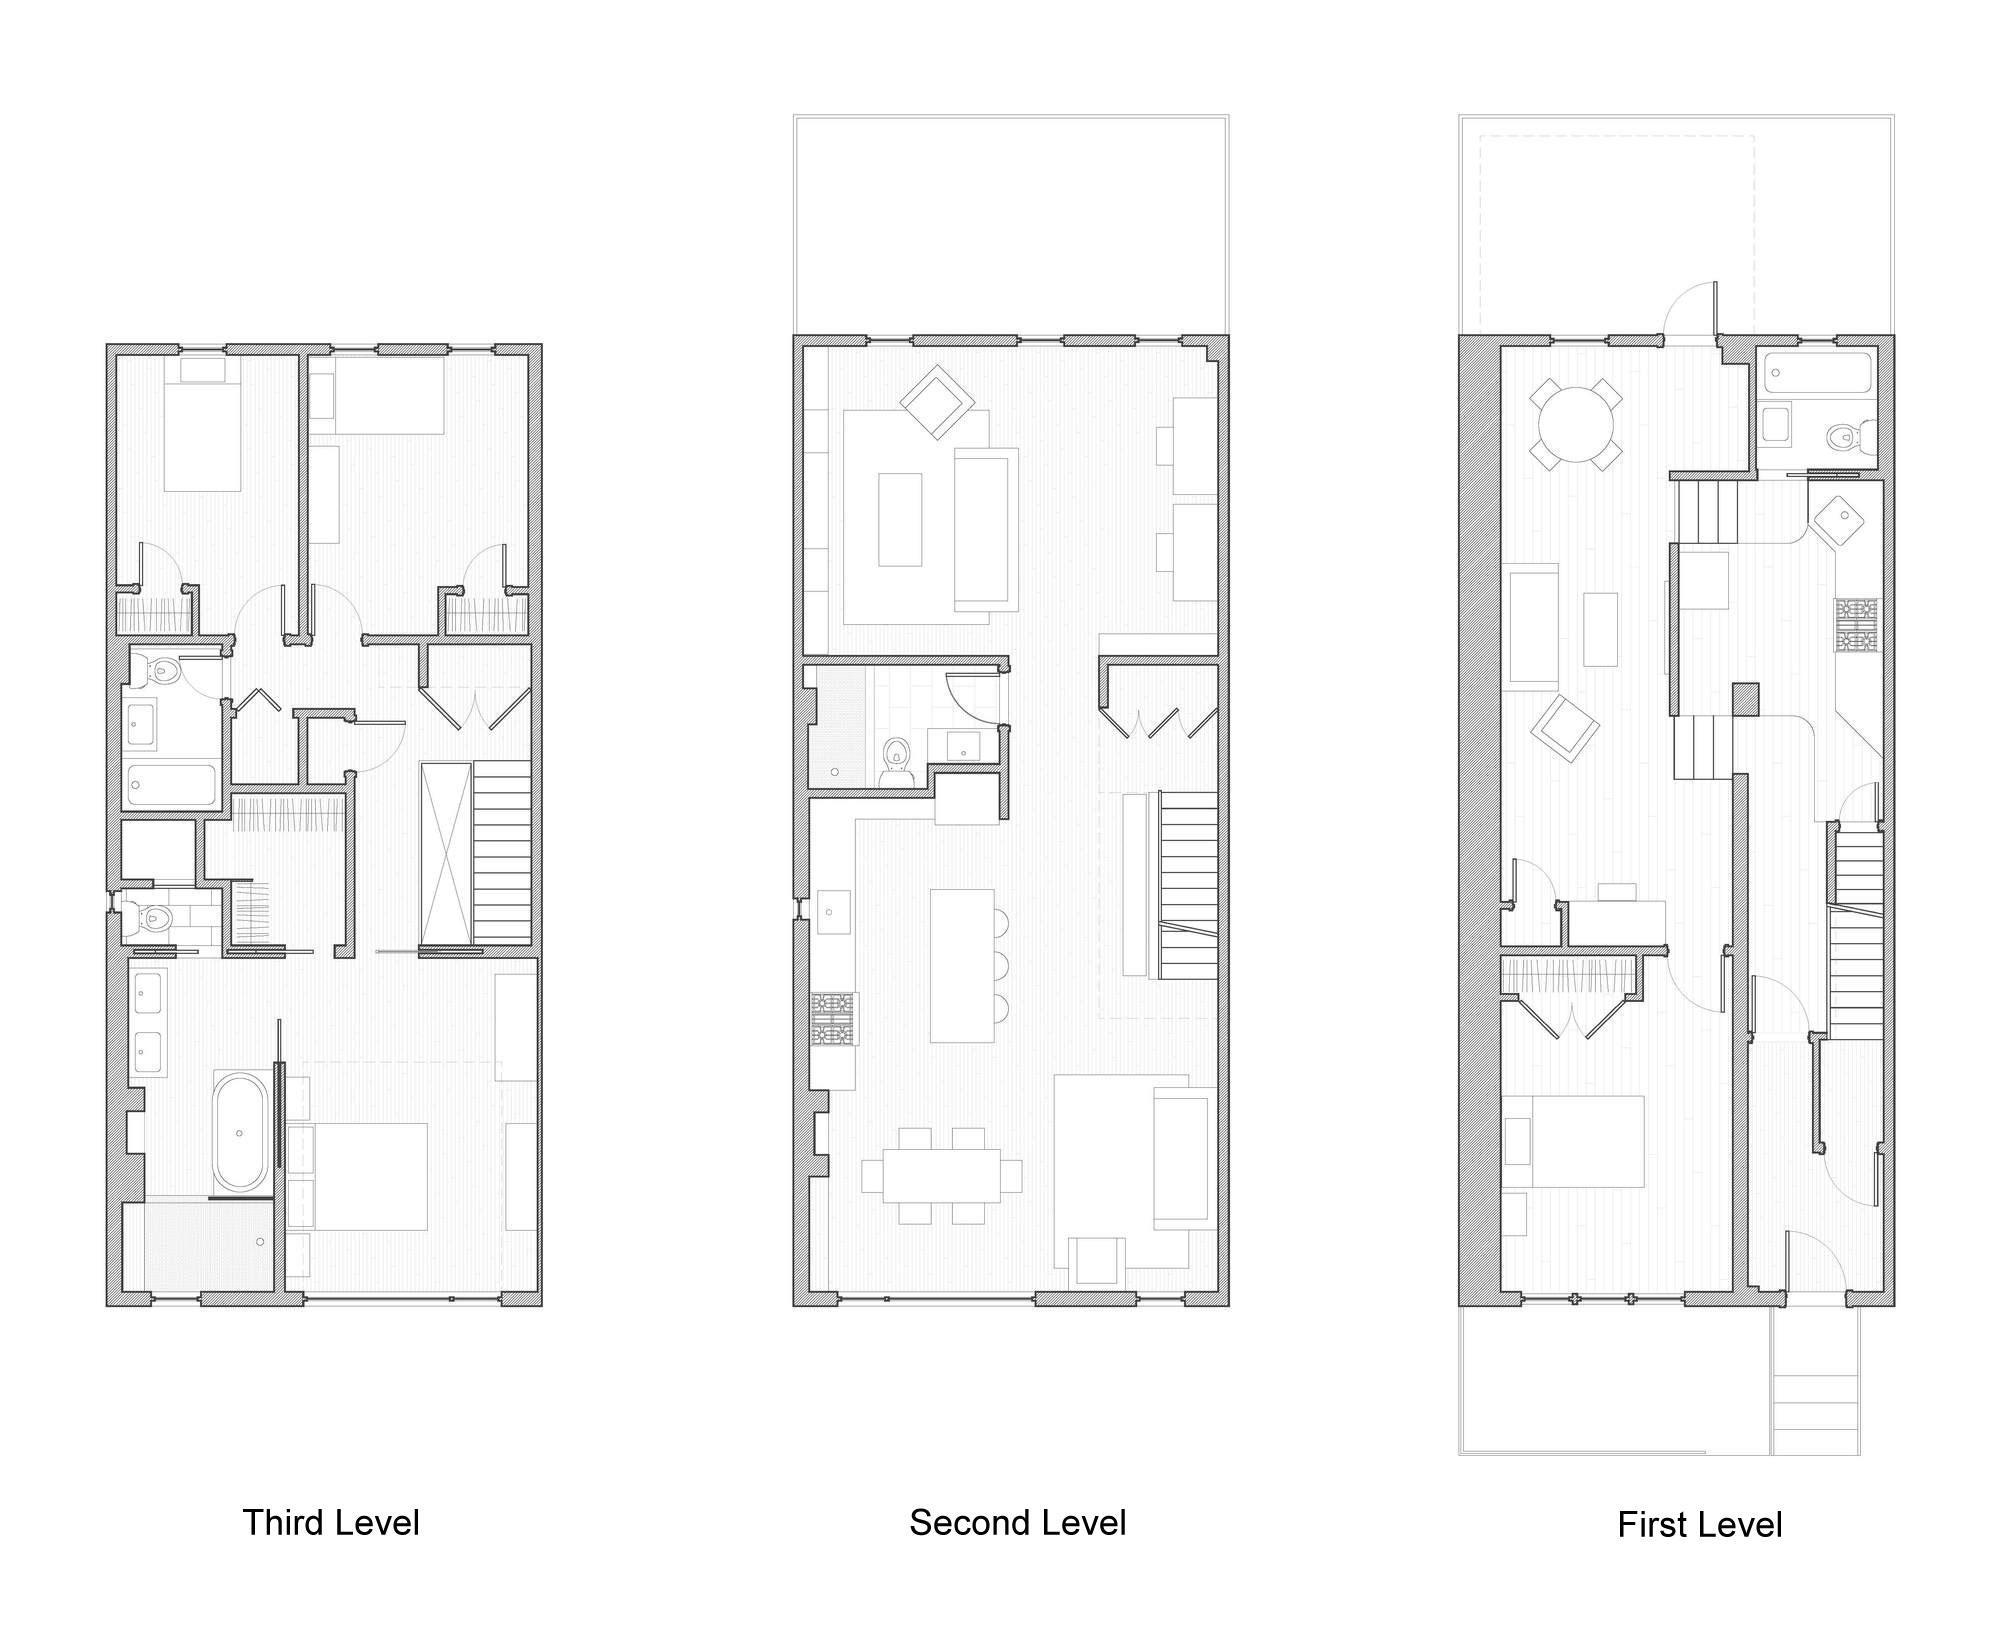 Gutman-Umansky Townhouse by Etelamaki Architecture-15